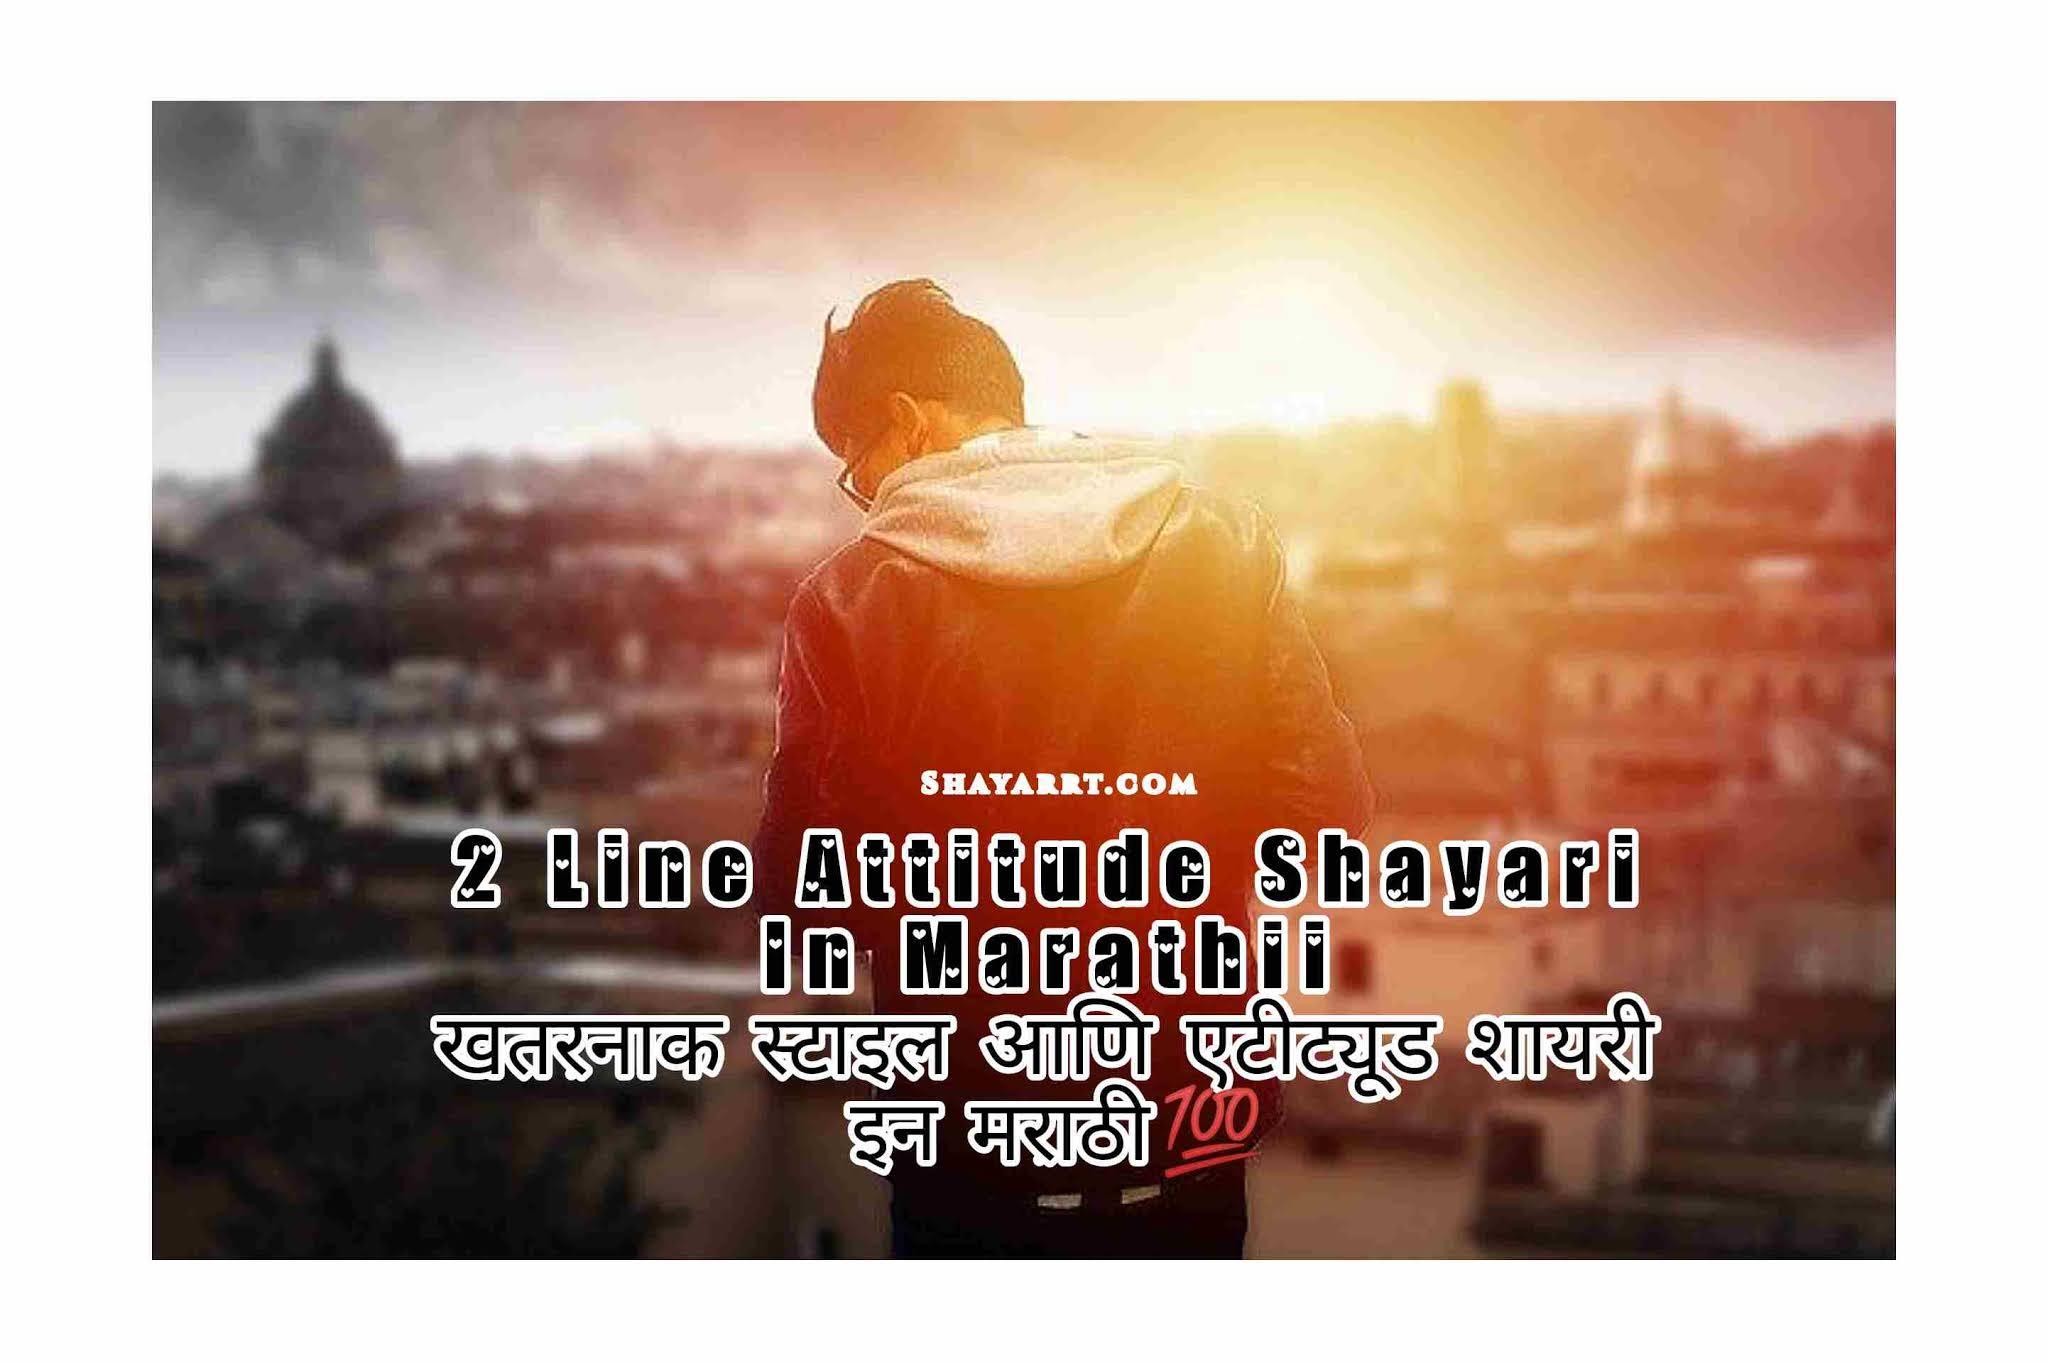 2 Line Attitude Shayari In Hindi, स्टाइल और एटीट्यूड शायरी